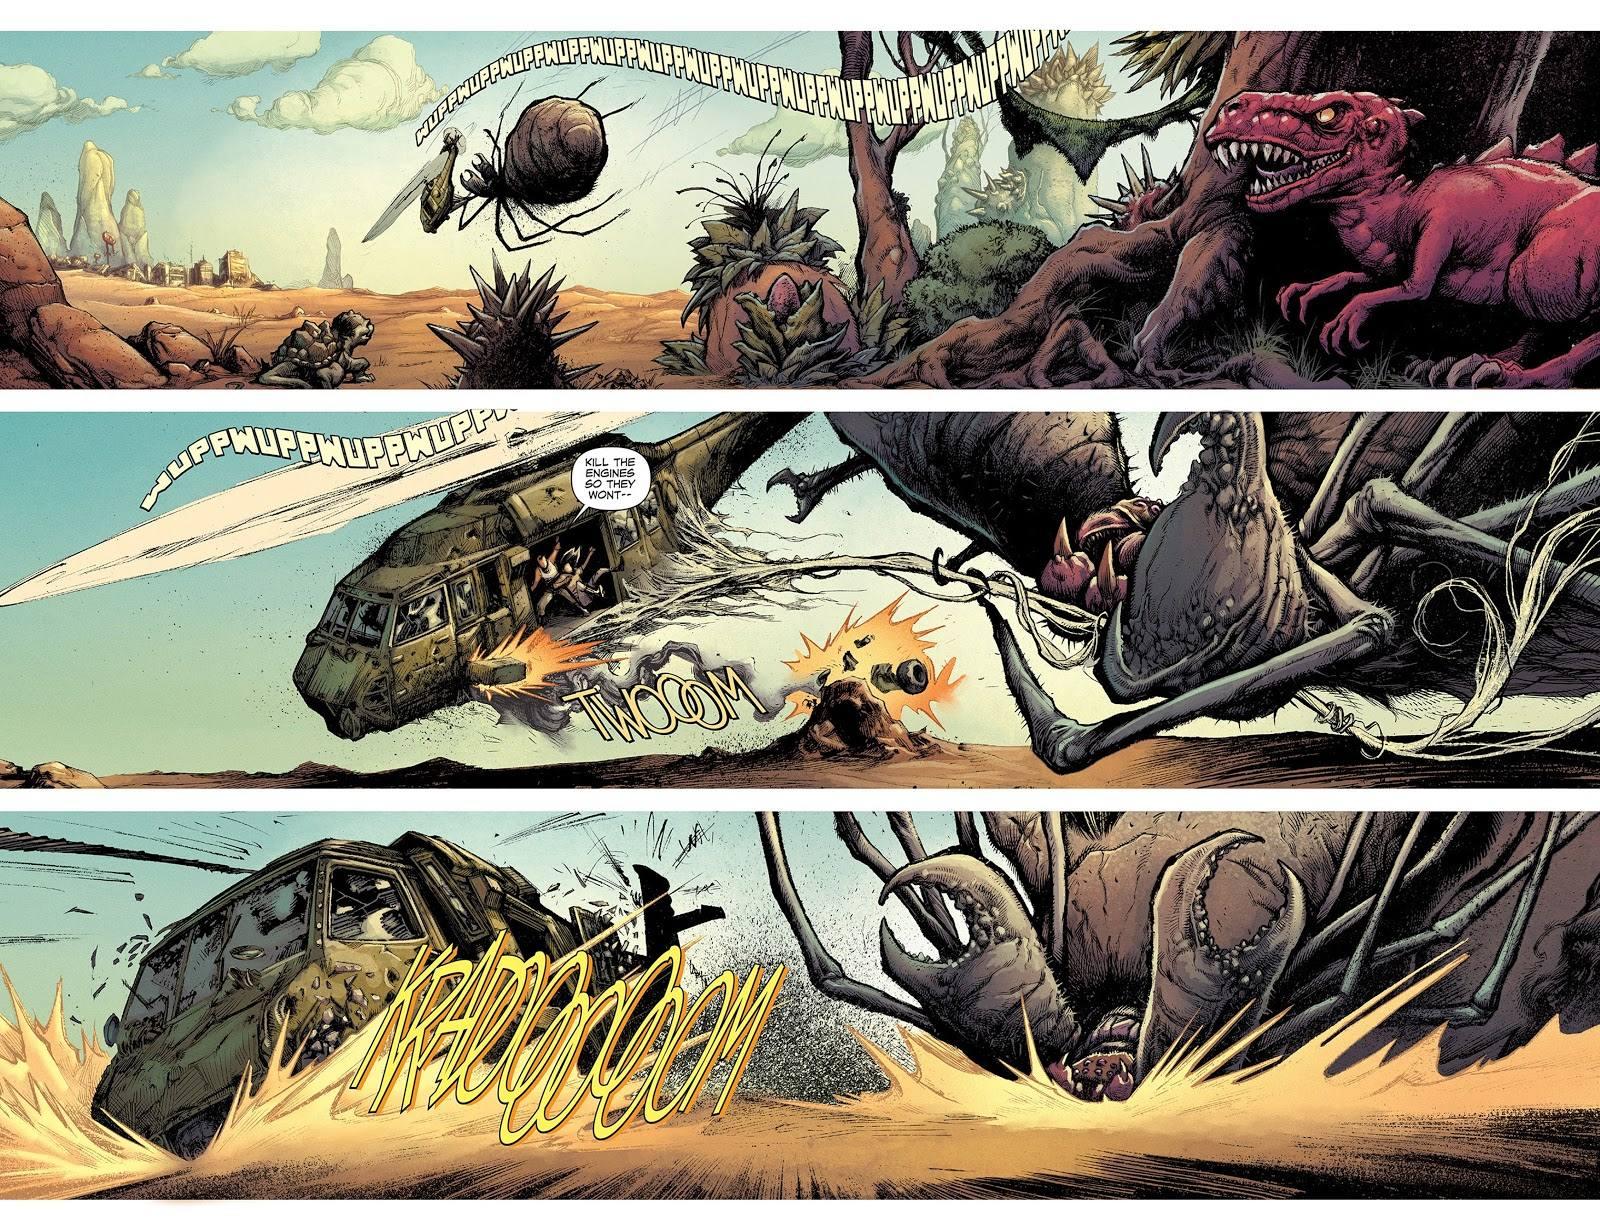 Devolution graphic novel review